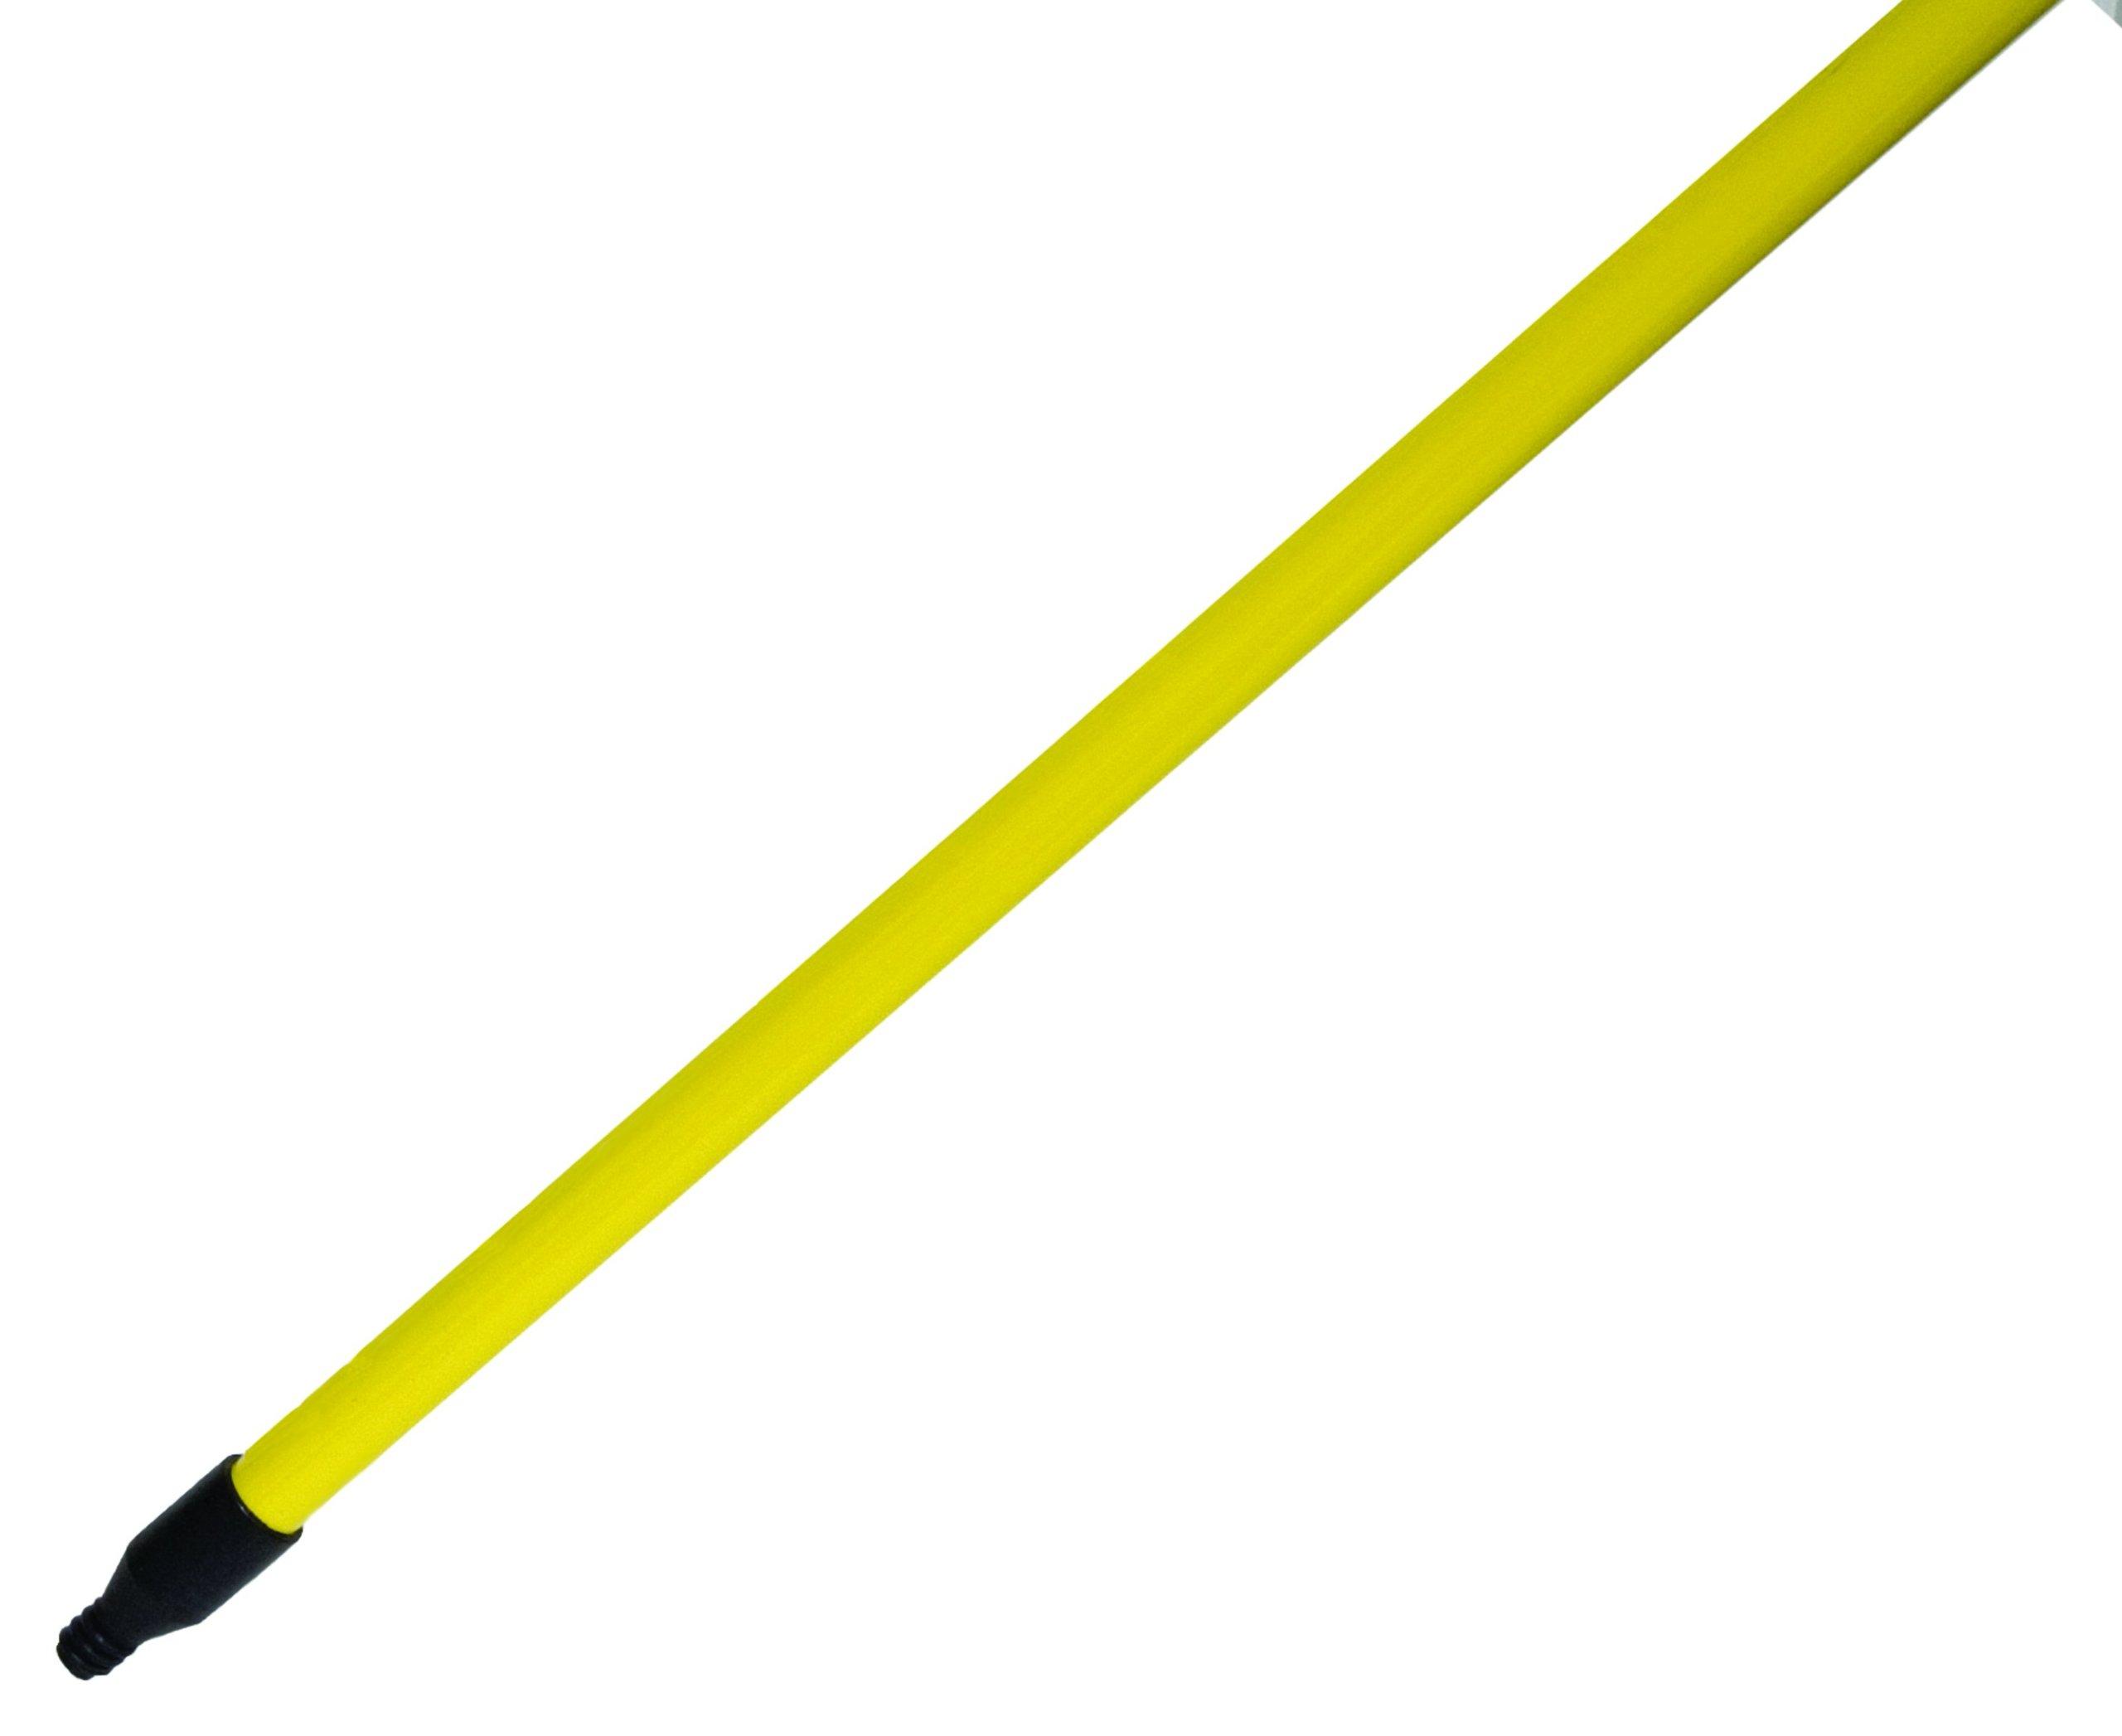 Magnolia Brush EC-FG72 Fiberglass Economy Handle, 1'' Diameter x 72'' Length, Yellow (Case of 12)